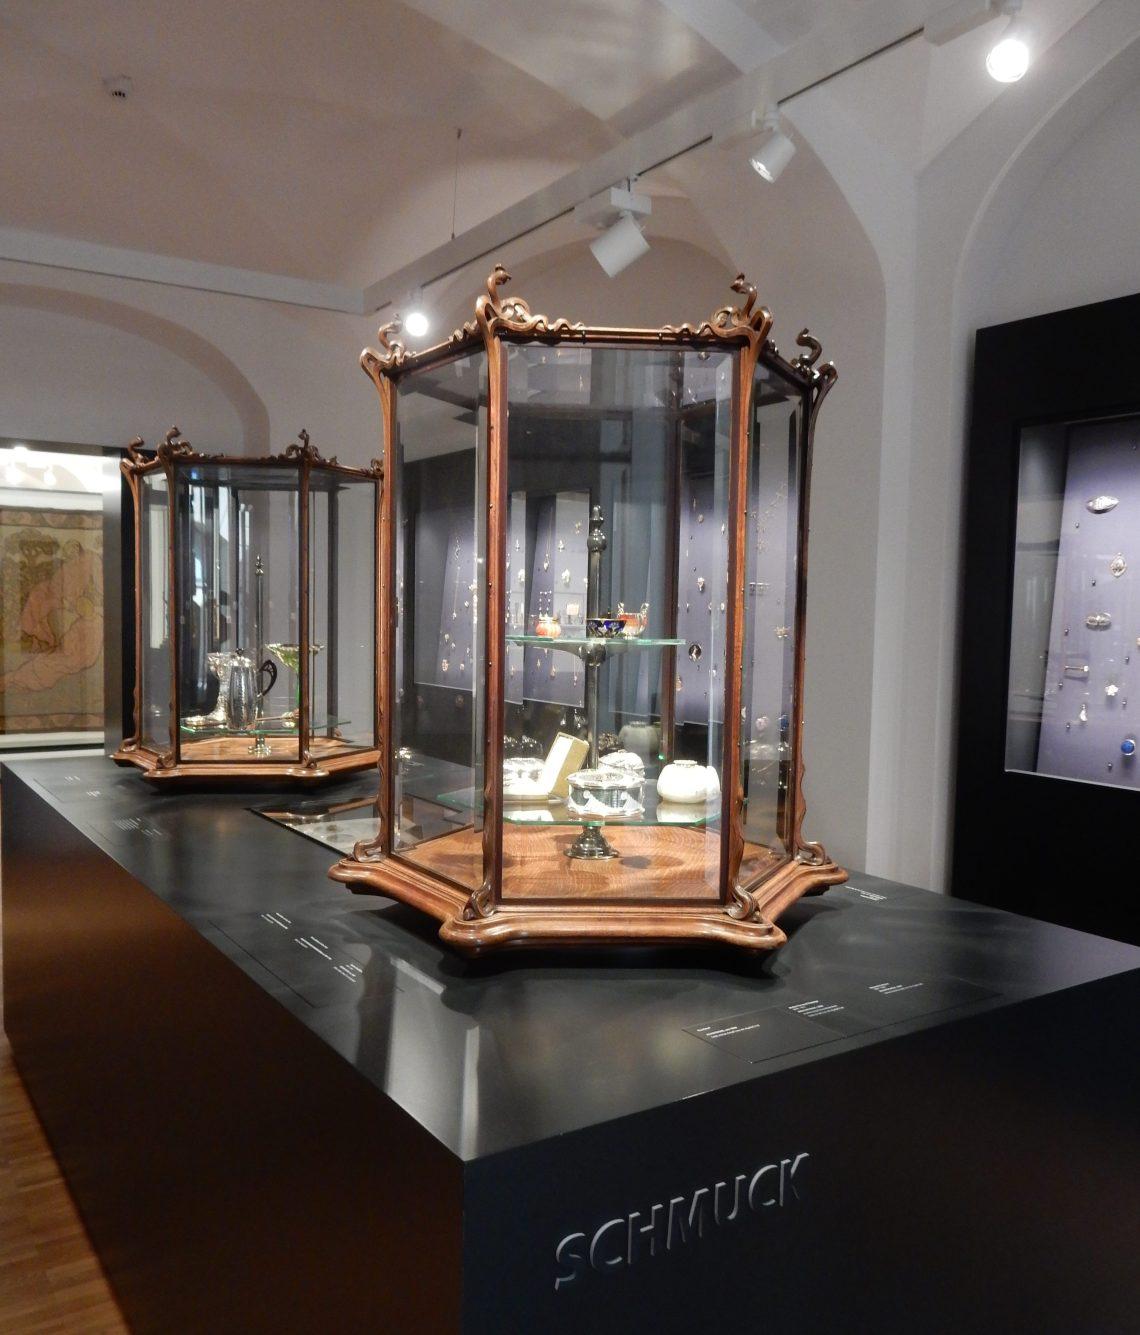 Philippe Wolfers, vitrines, circa 1897, Hessisches Landesmuseum Darmstadt, 10 september 2017. Foto met dank aan Coert Peter Krabbe, CC BY 4.0